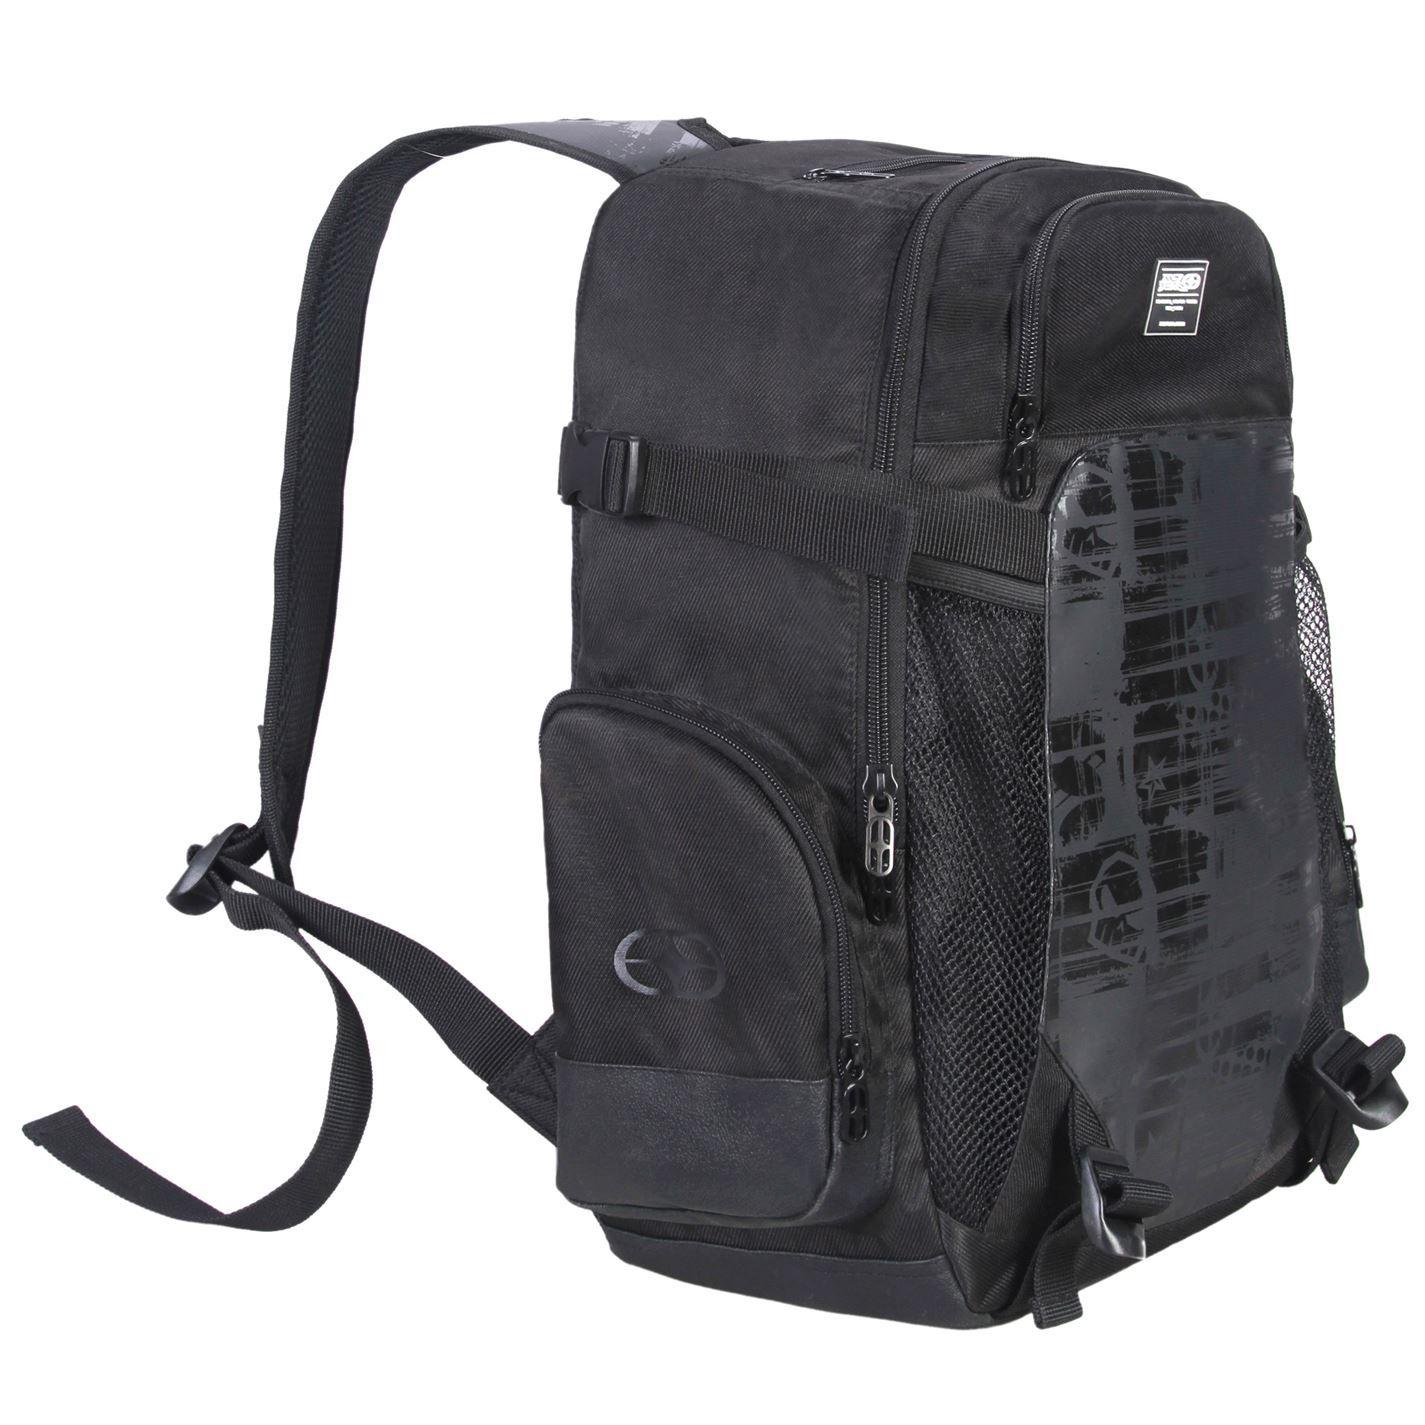 No Fear MX Backpack Bag